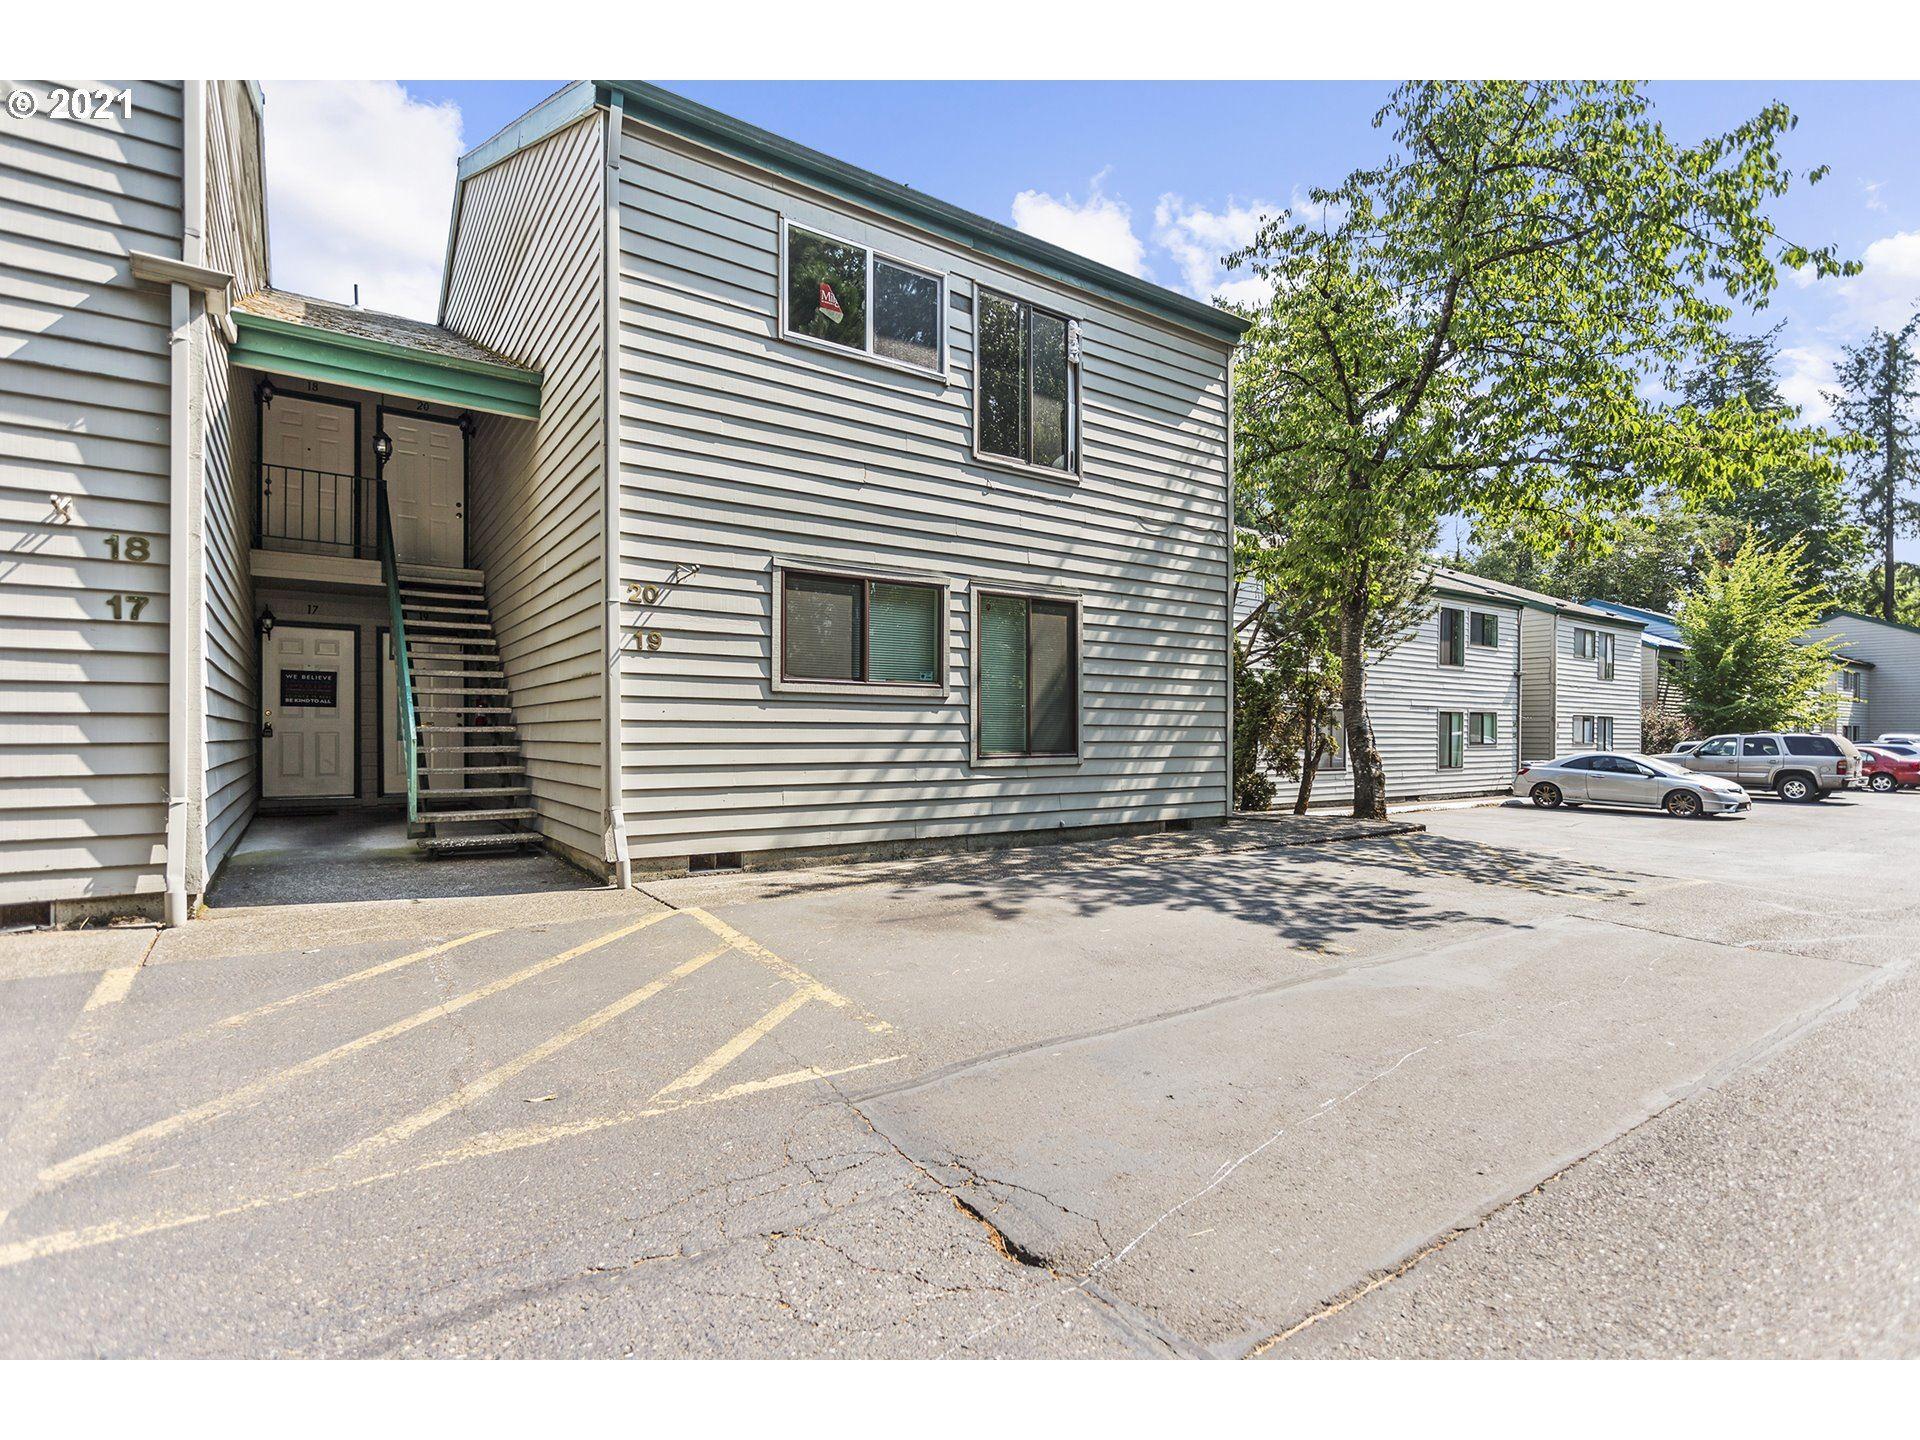 Photo of 6745 SW SCHOLLS FERRY RD #19, Beaverton, OR 97008 (MLS # 21420377)